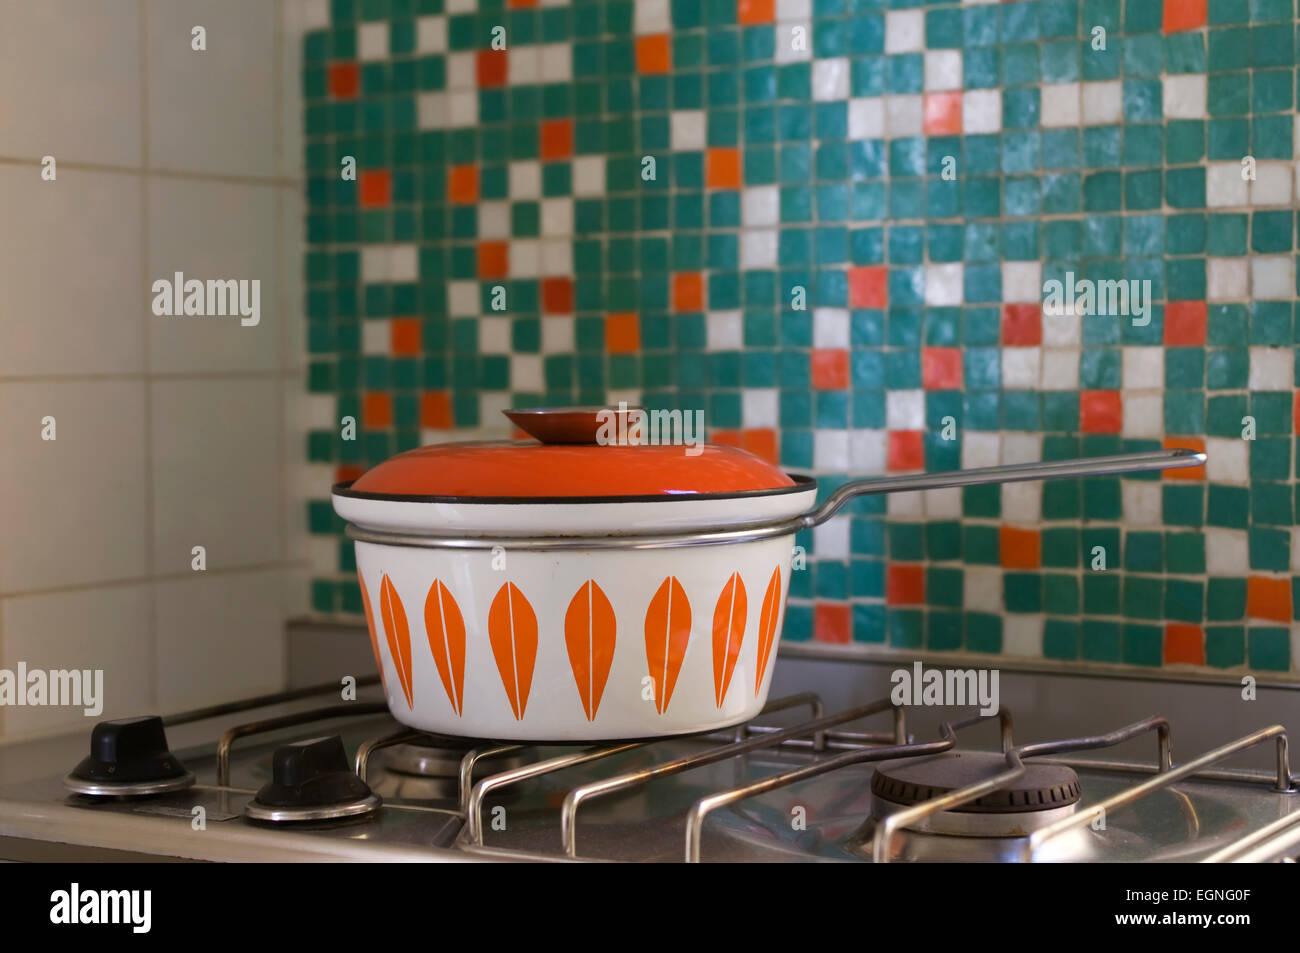 1960s kitchen stove stockfotos 1960s kitchen stove bilder alamy. Black Bedroom Furniture Sets. Home Design Ideas